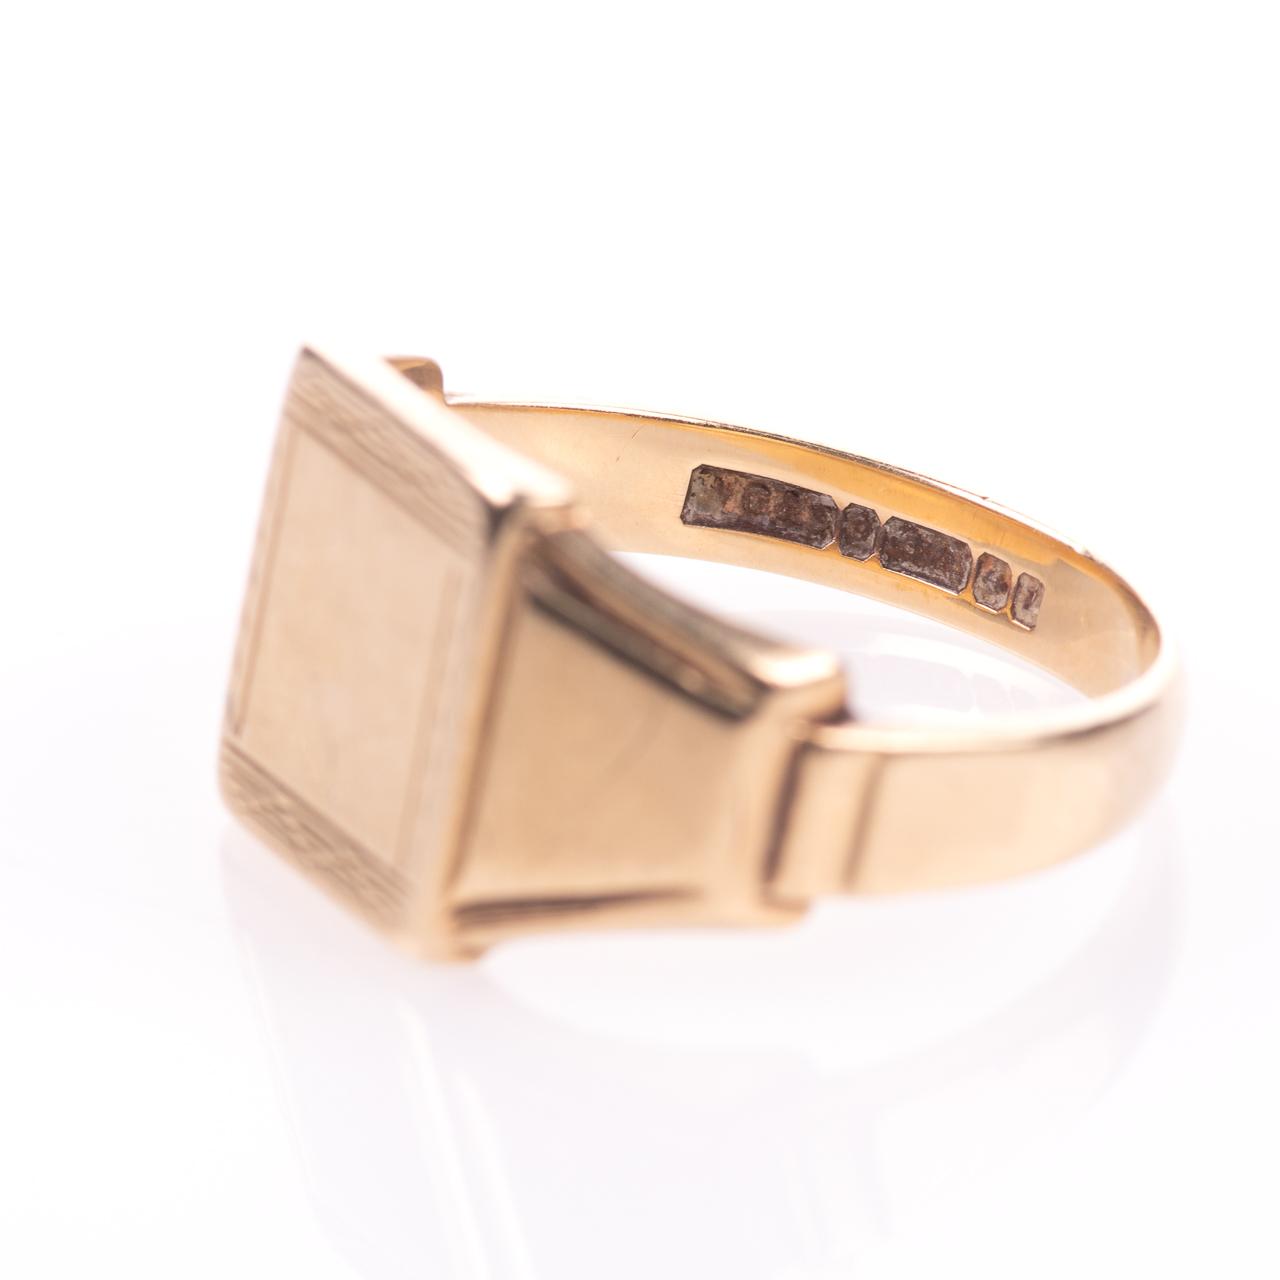 Art Deco Style Gentleman's Signet Ring 9ct Gold - Image 5 of 7